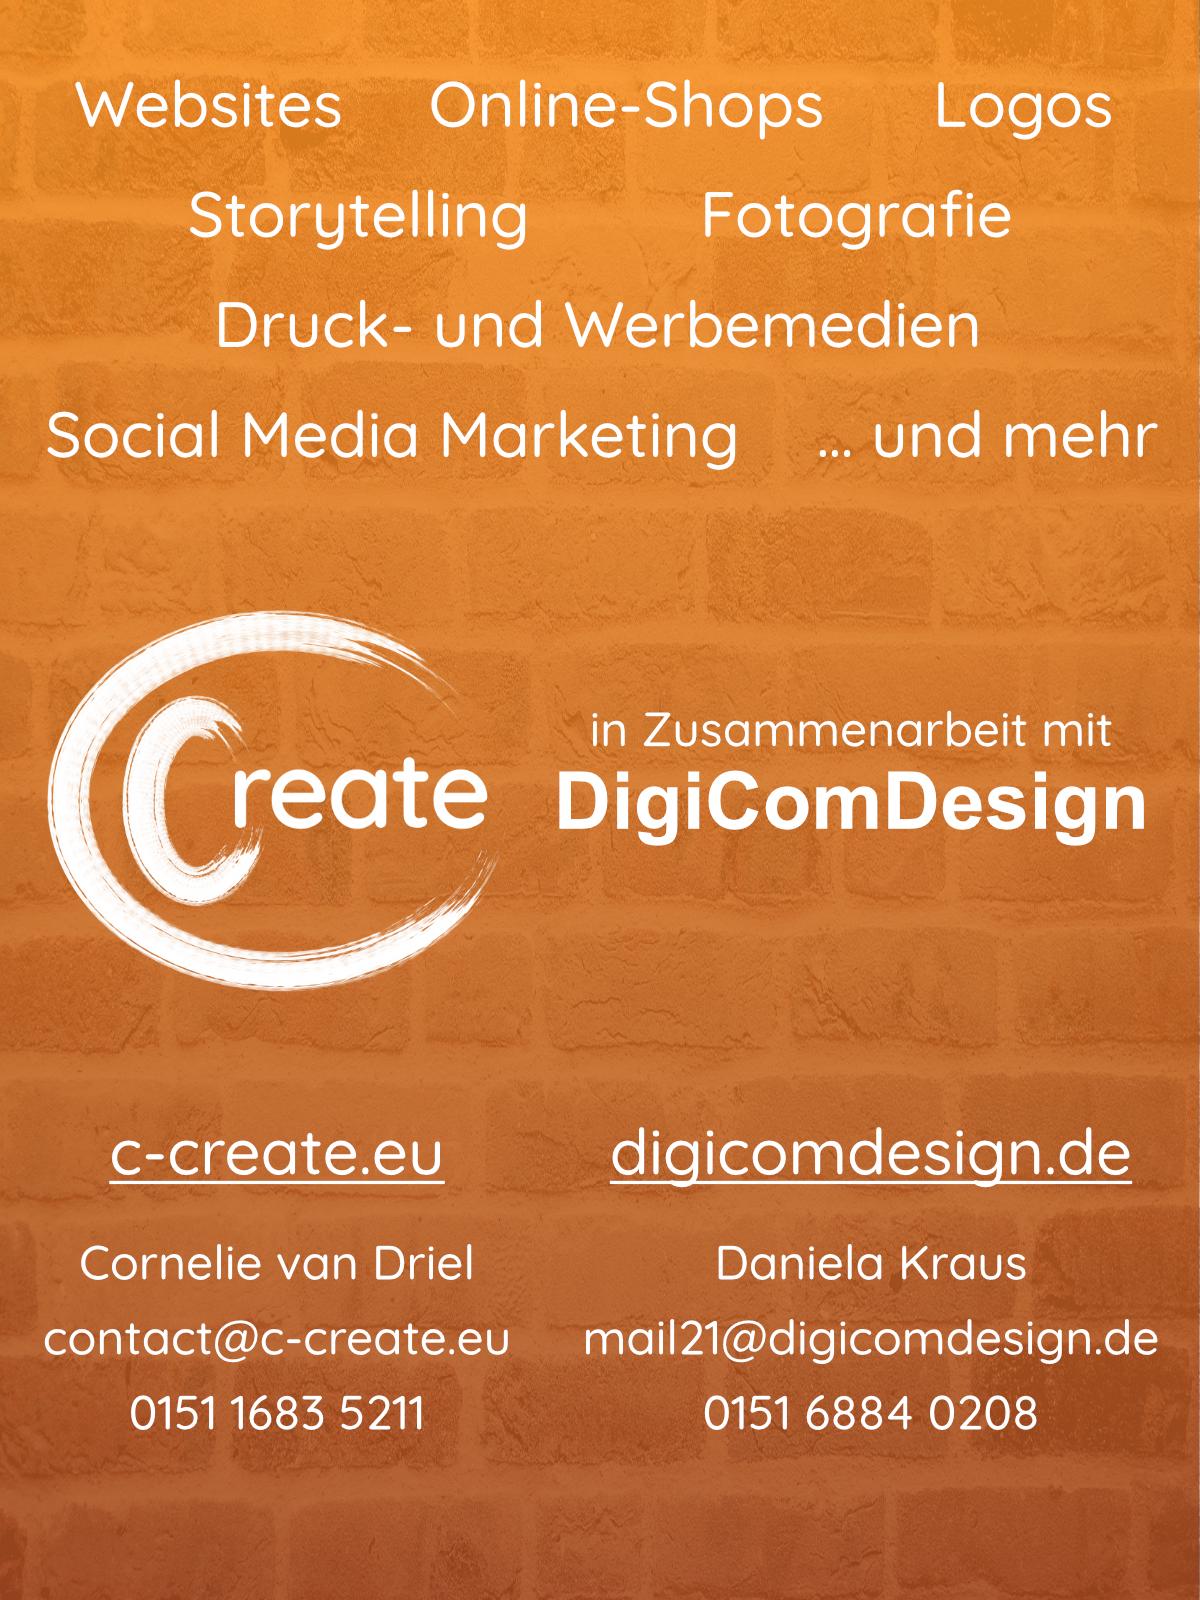 C-Create by Cornelie van Driel